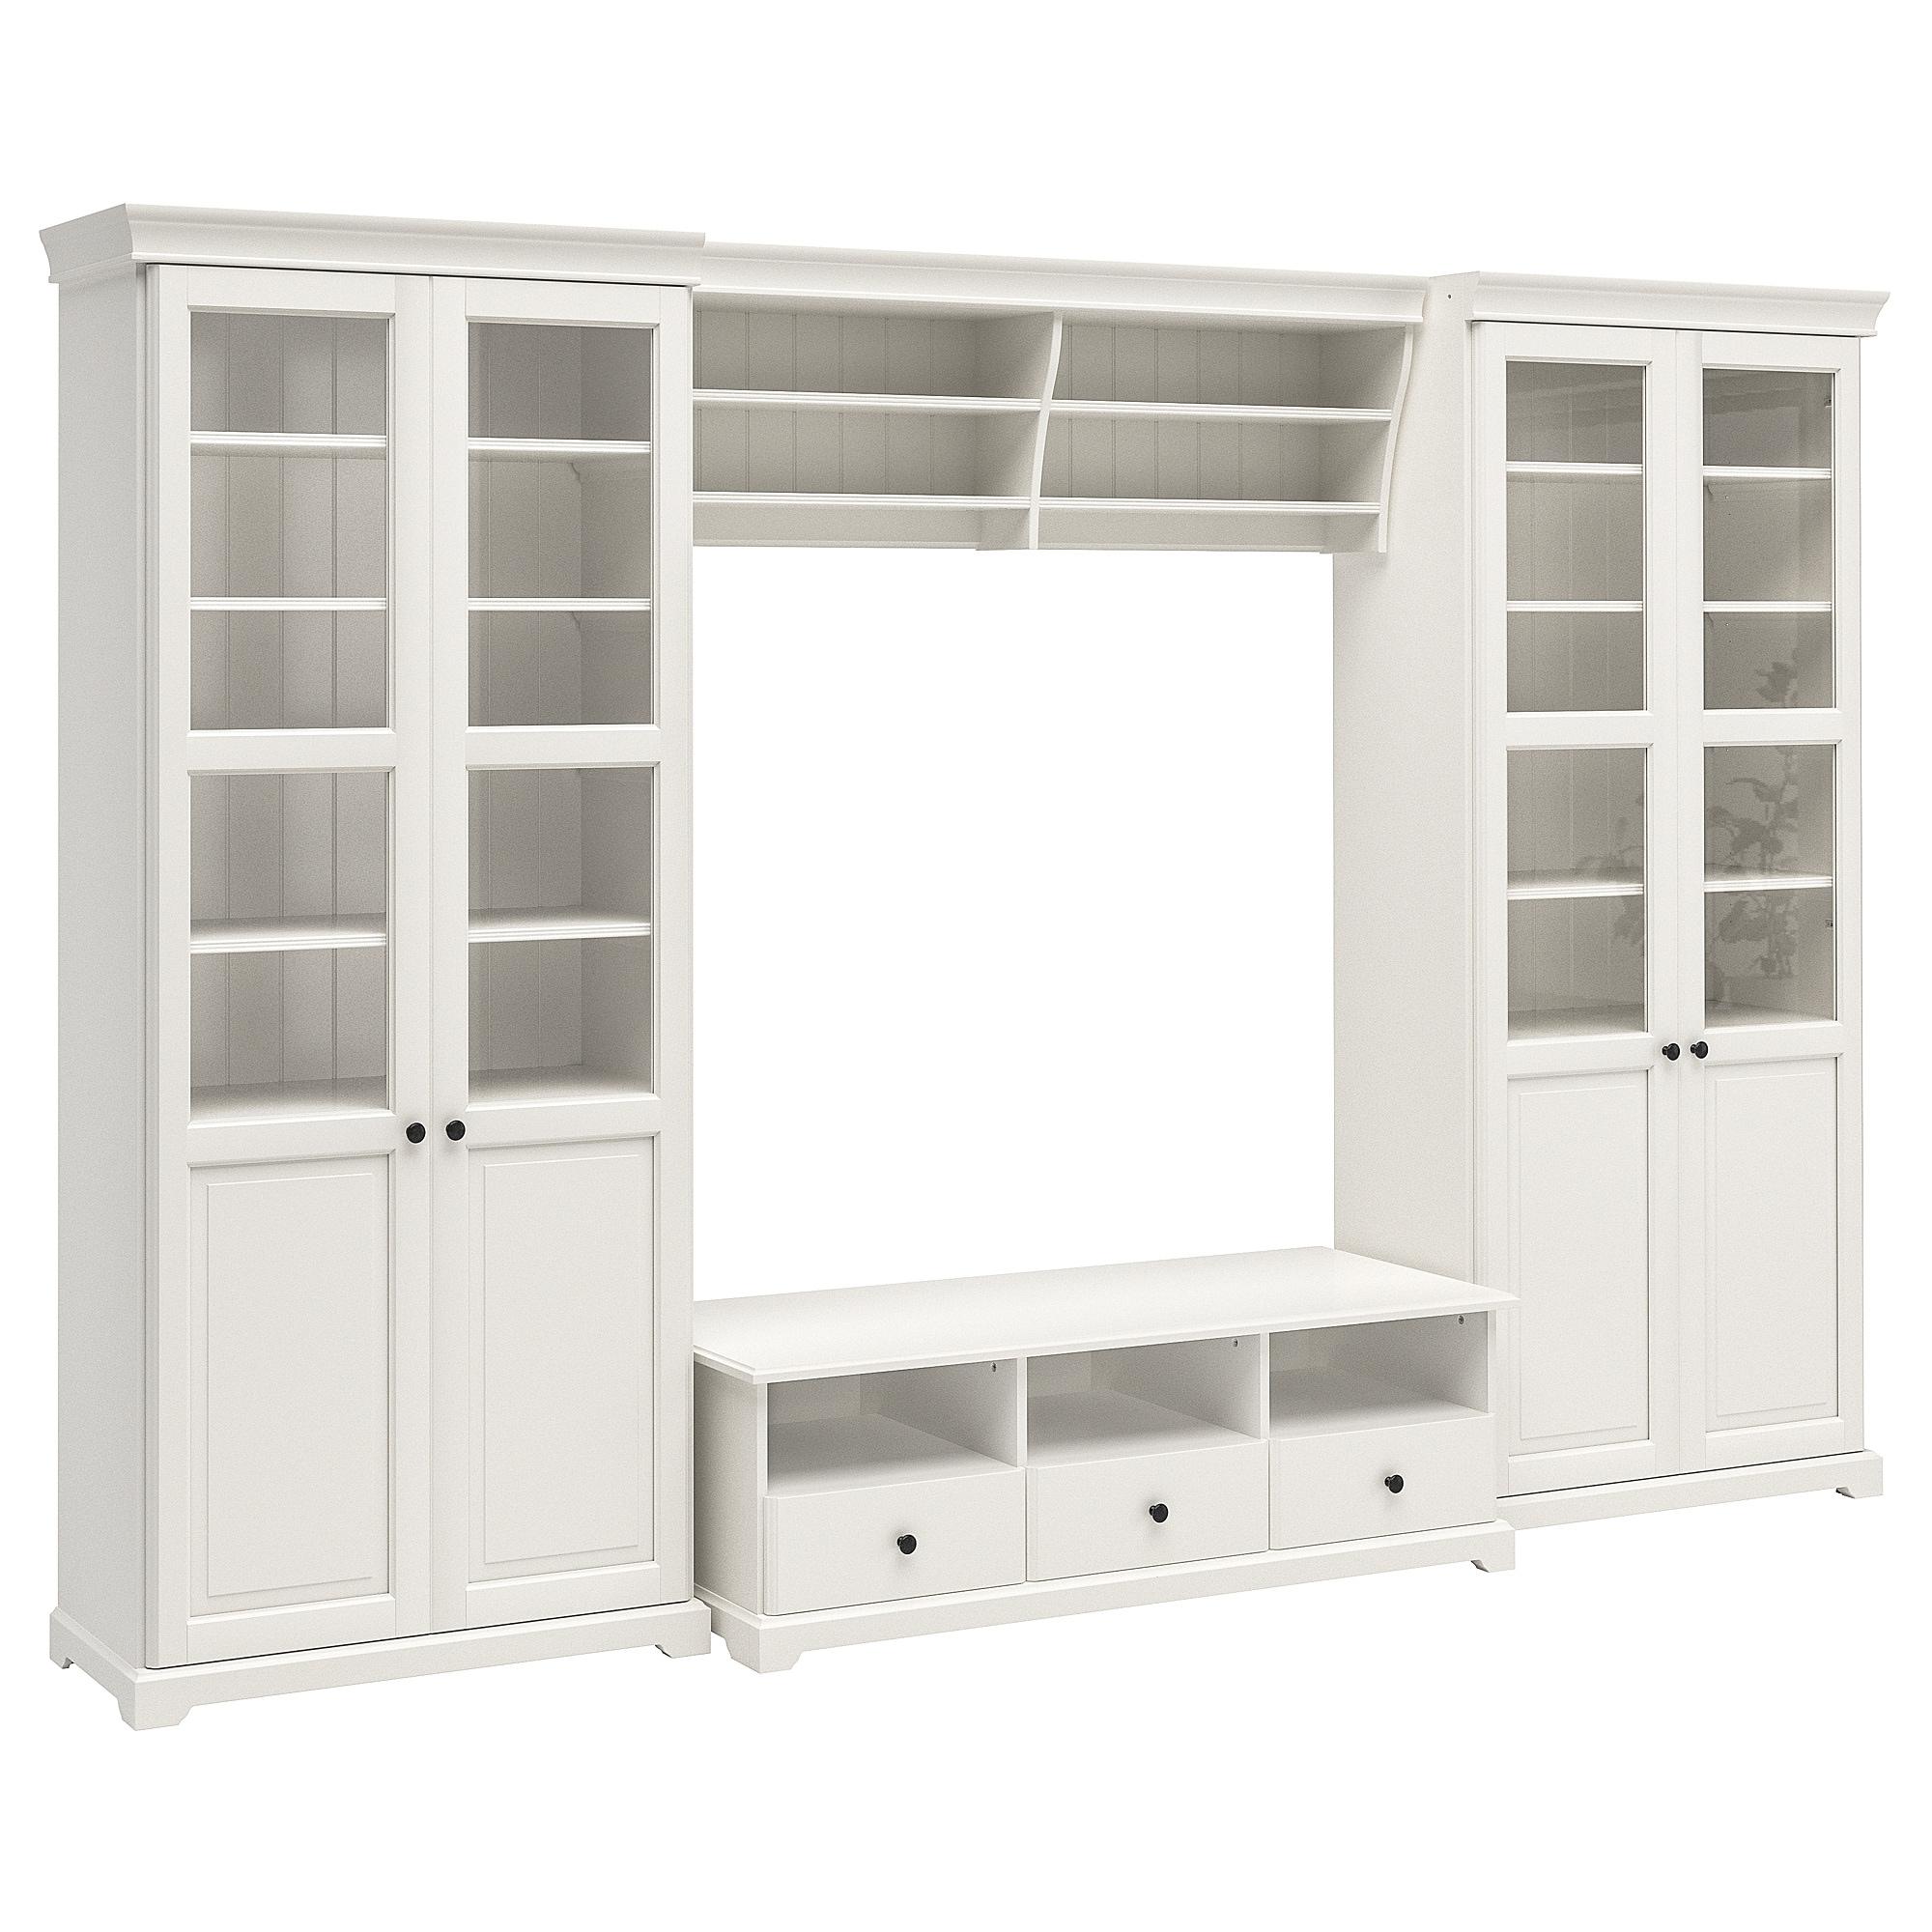 Muebles S5d8 Liatorp Mueble Tv Con Almacenaje Blanco 332 X 214 Cm Ikea